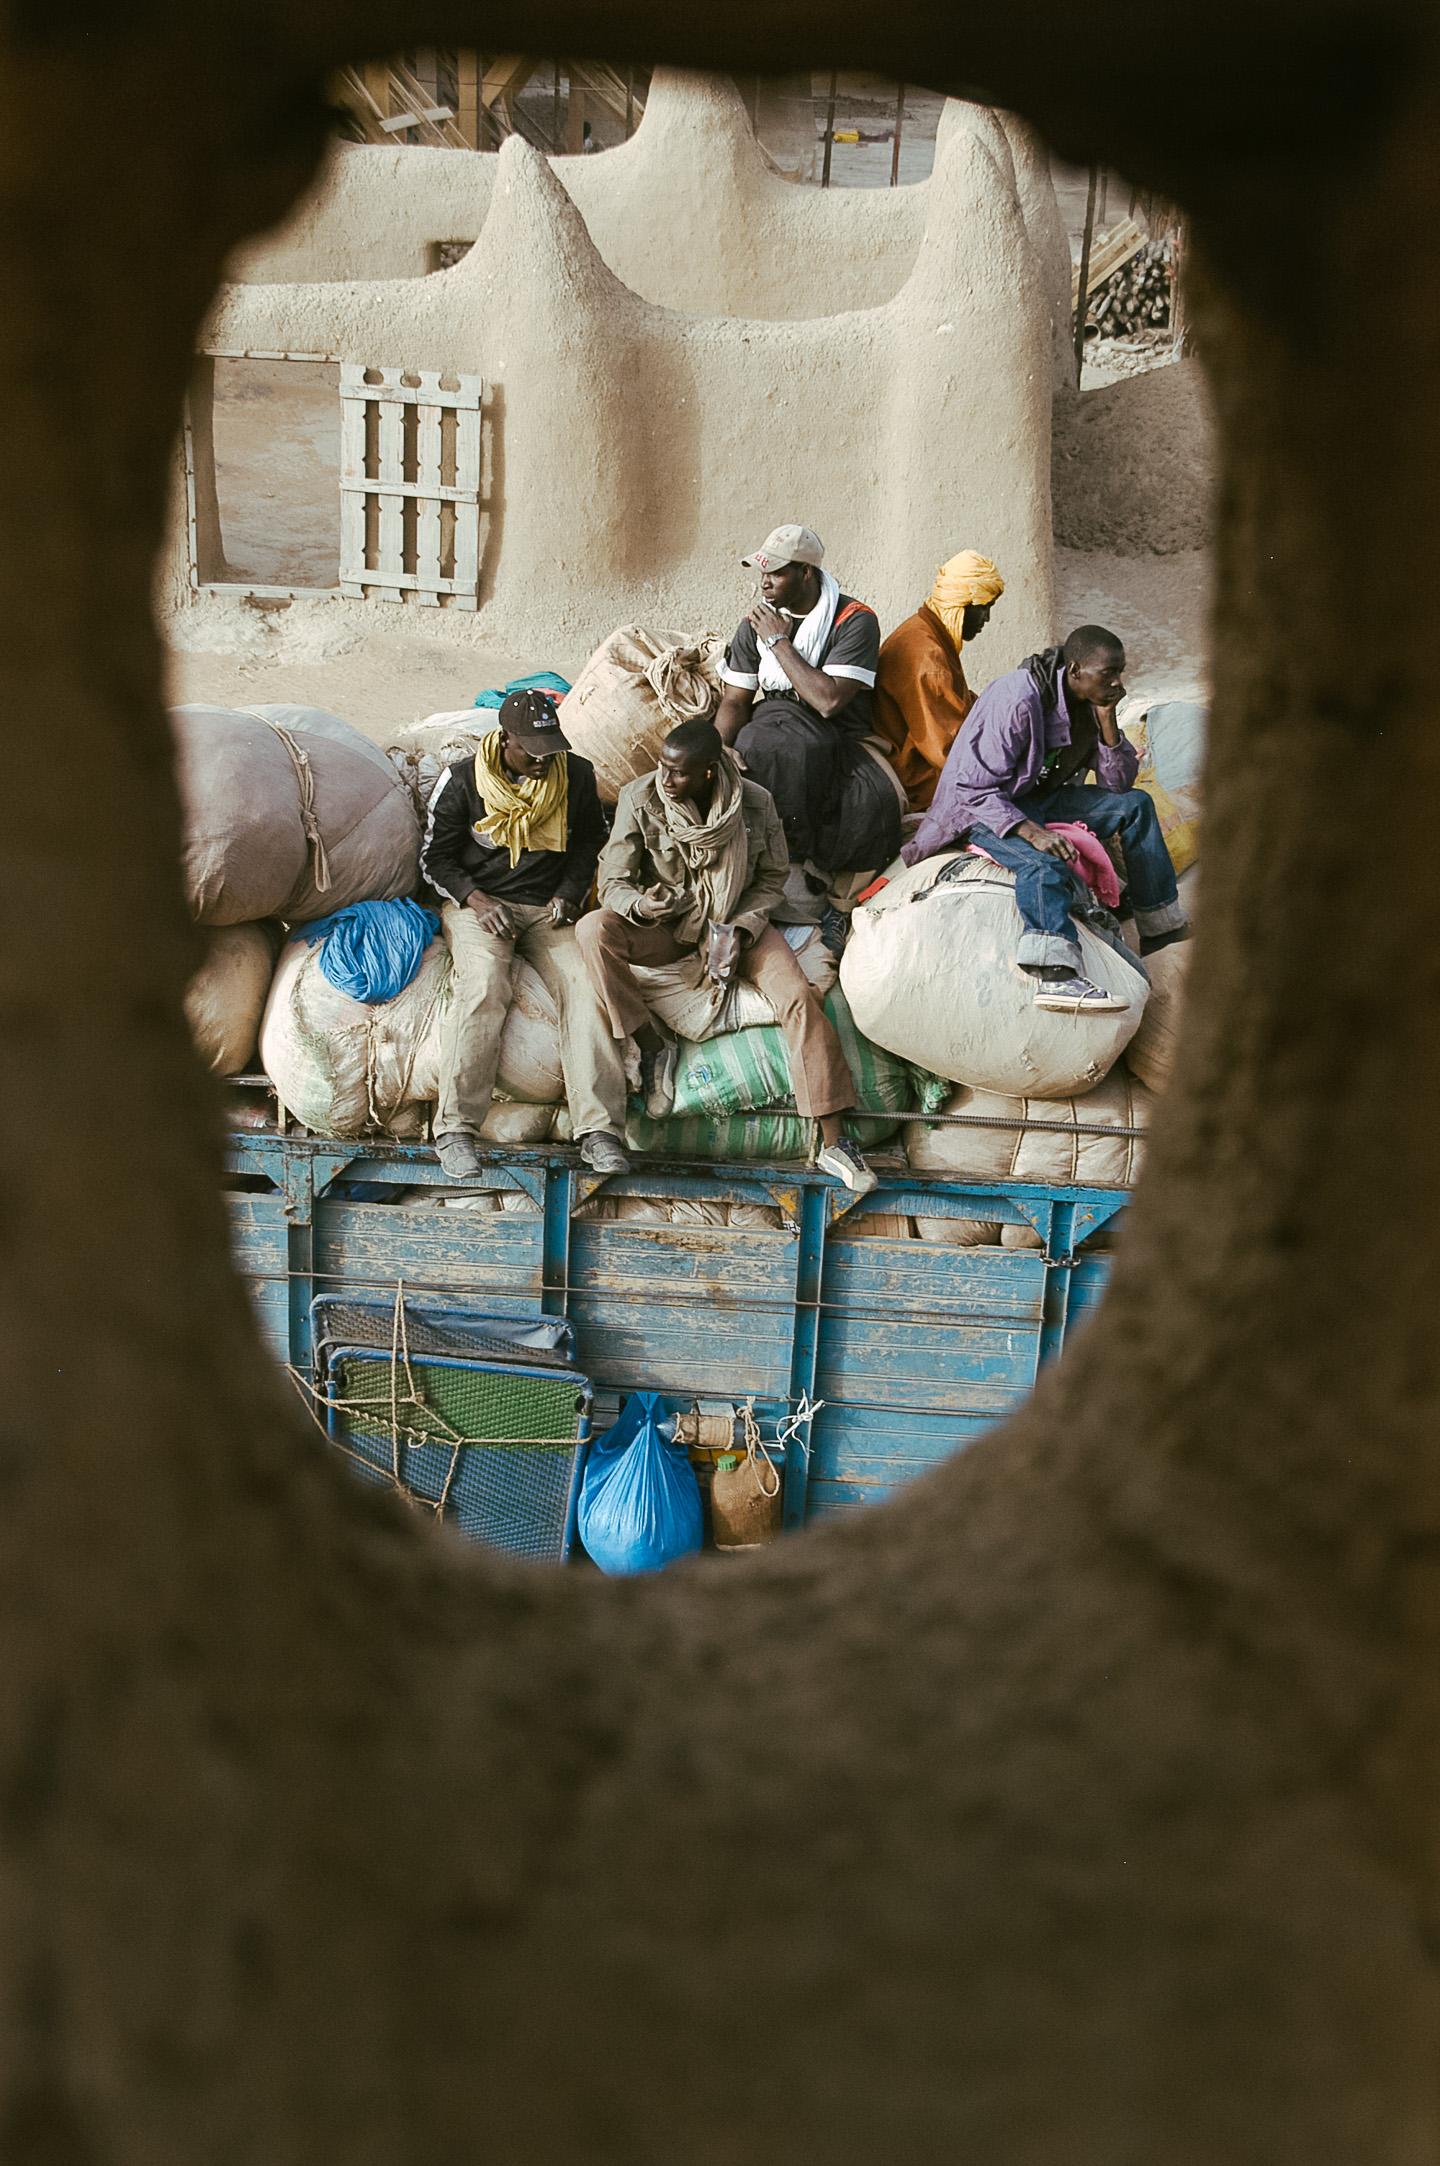 Rund um Afrika - Mali - Westafrika - Transafrika-442